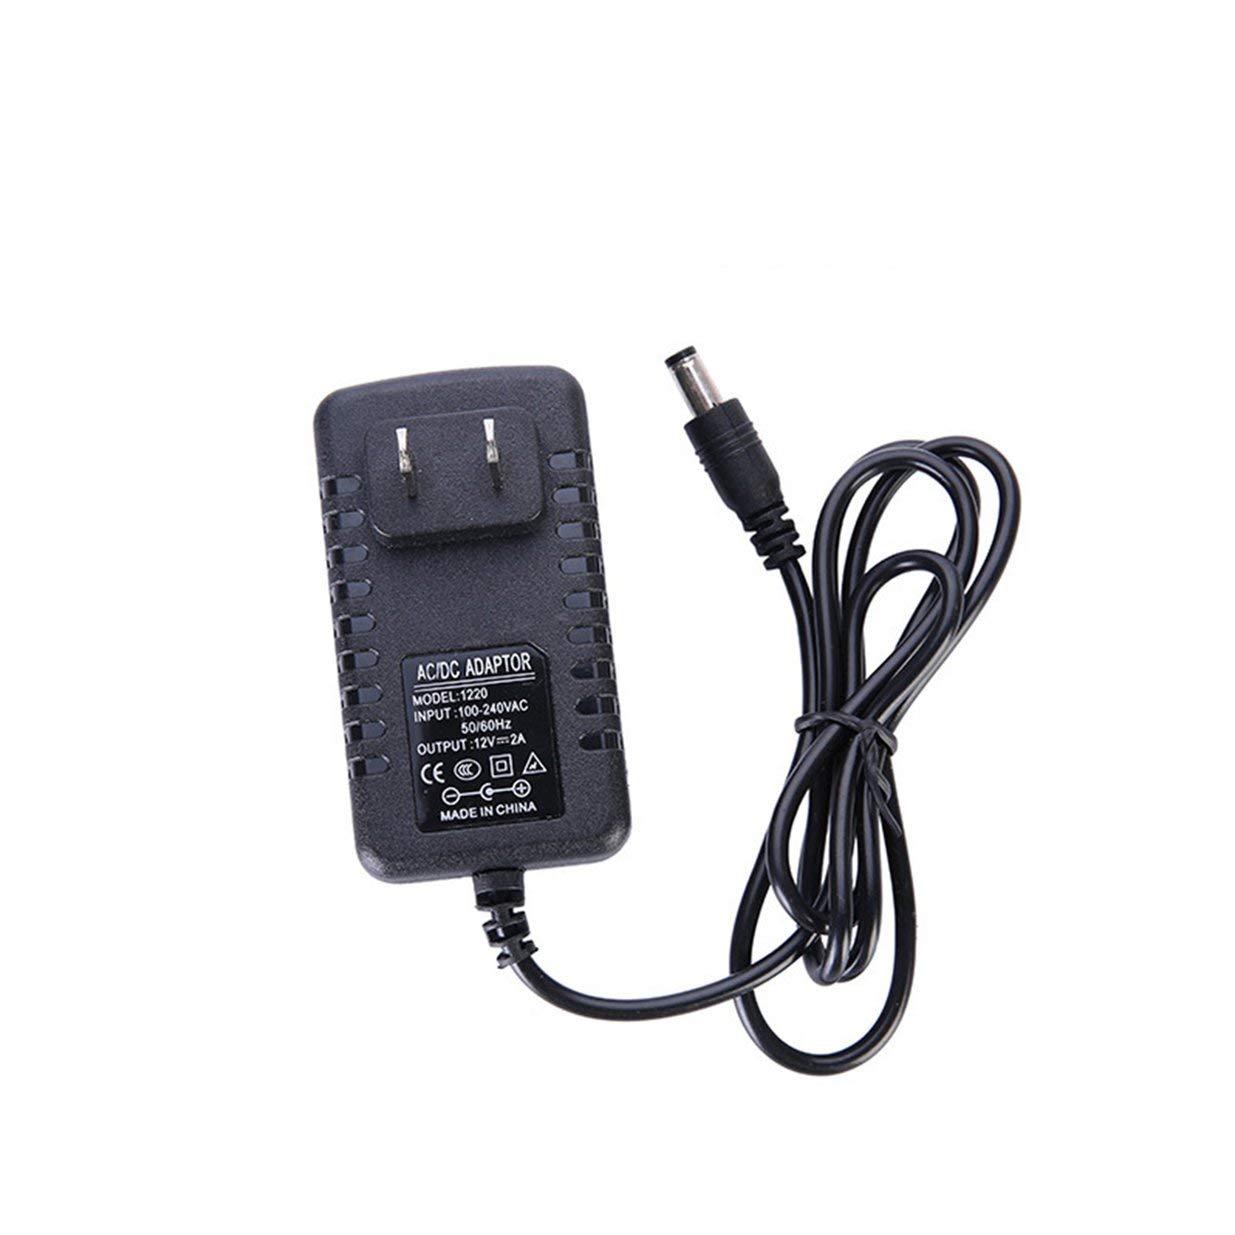 Banbie8409 AC Electric Air Pump Home Inflate Deflate For Air Mattress 100V~240V//12V-black